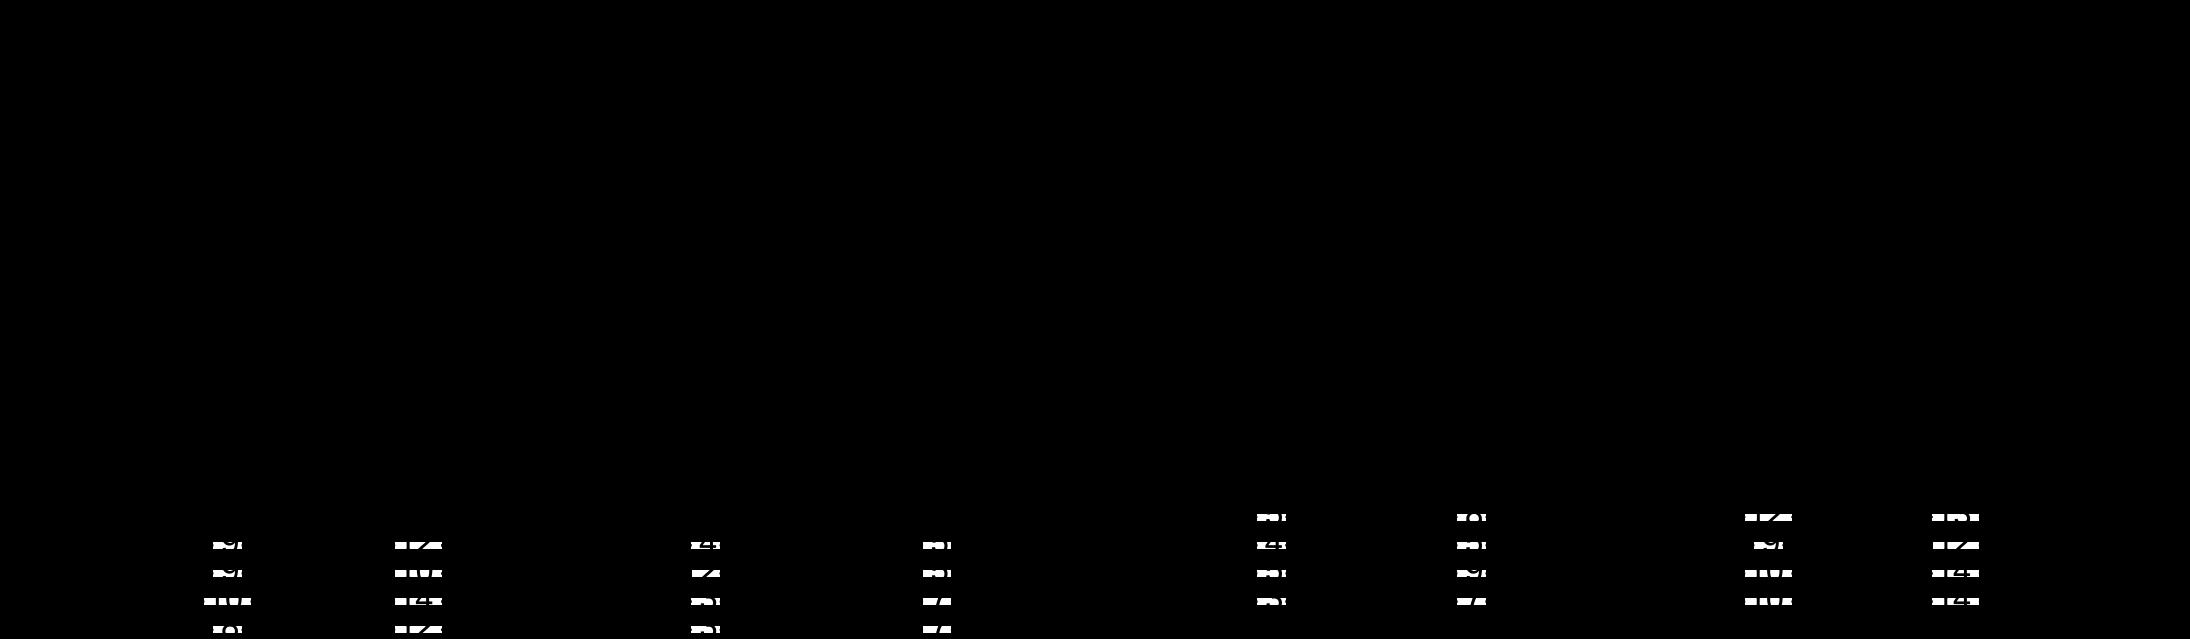 carraher-cmaj7